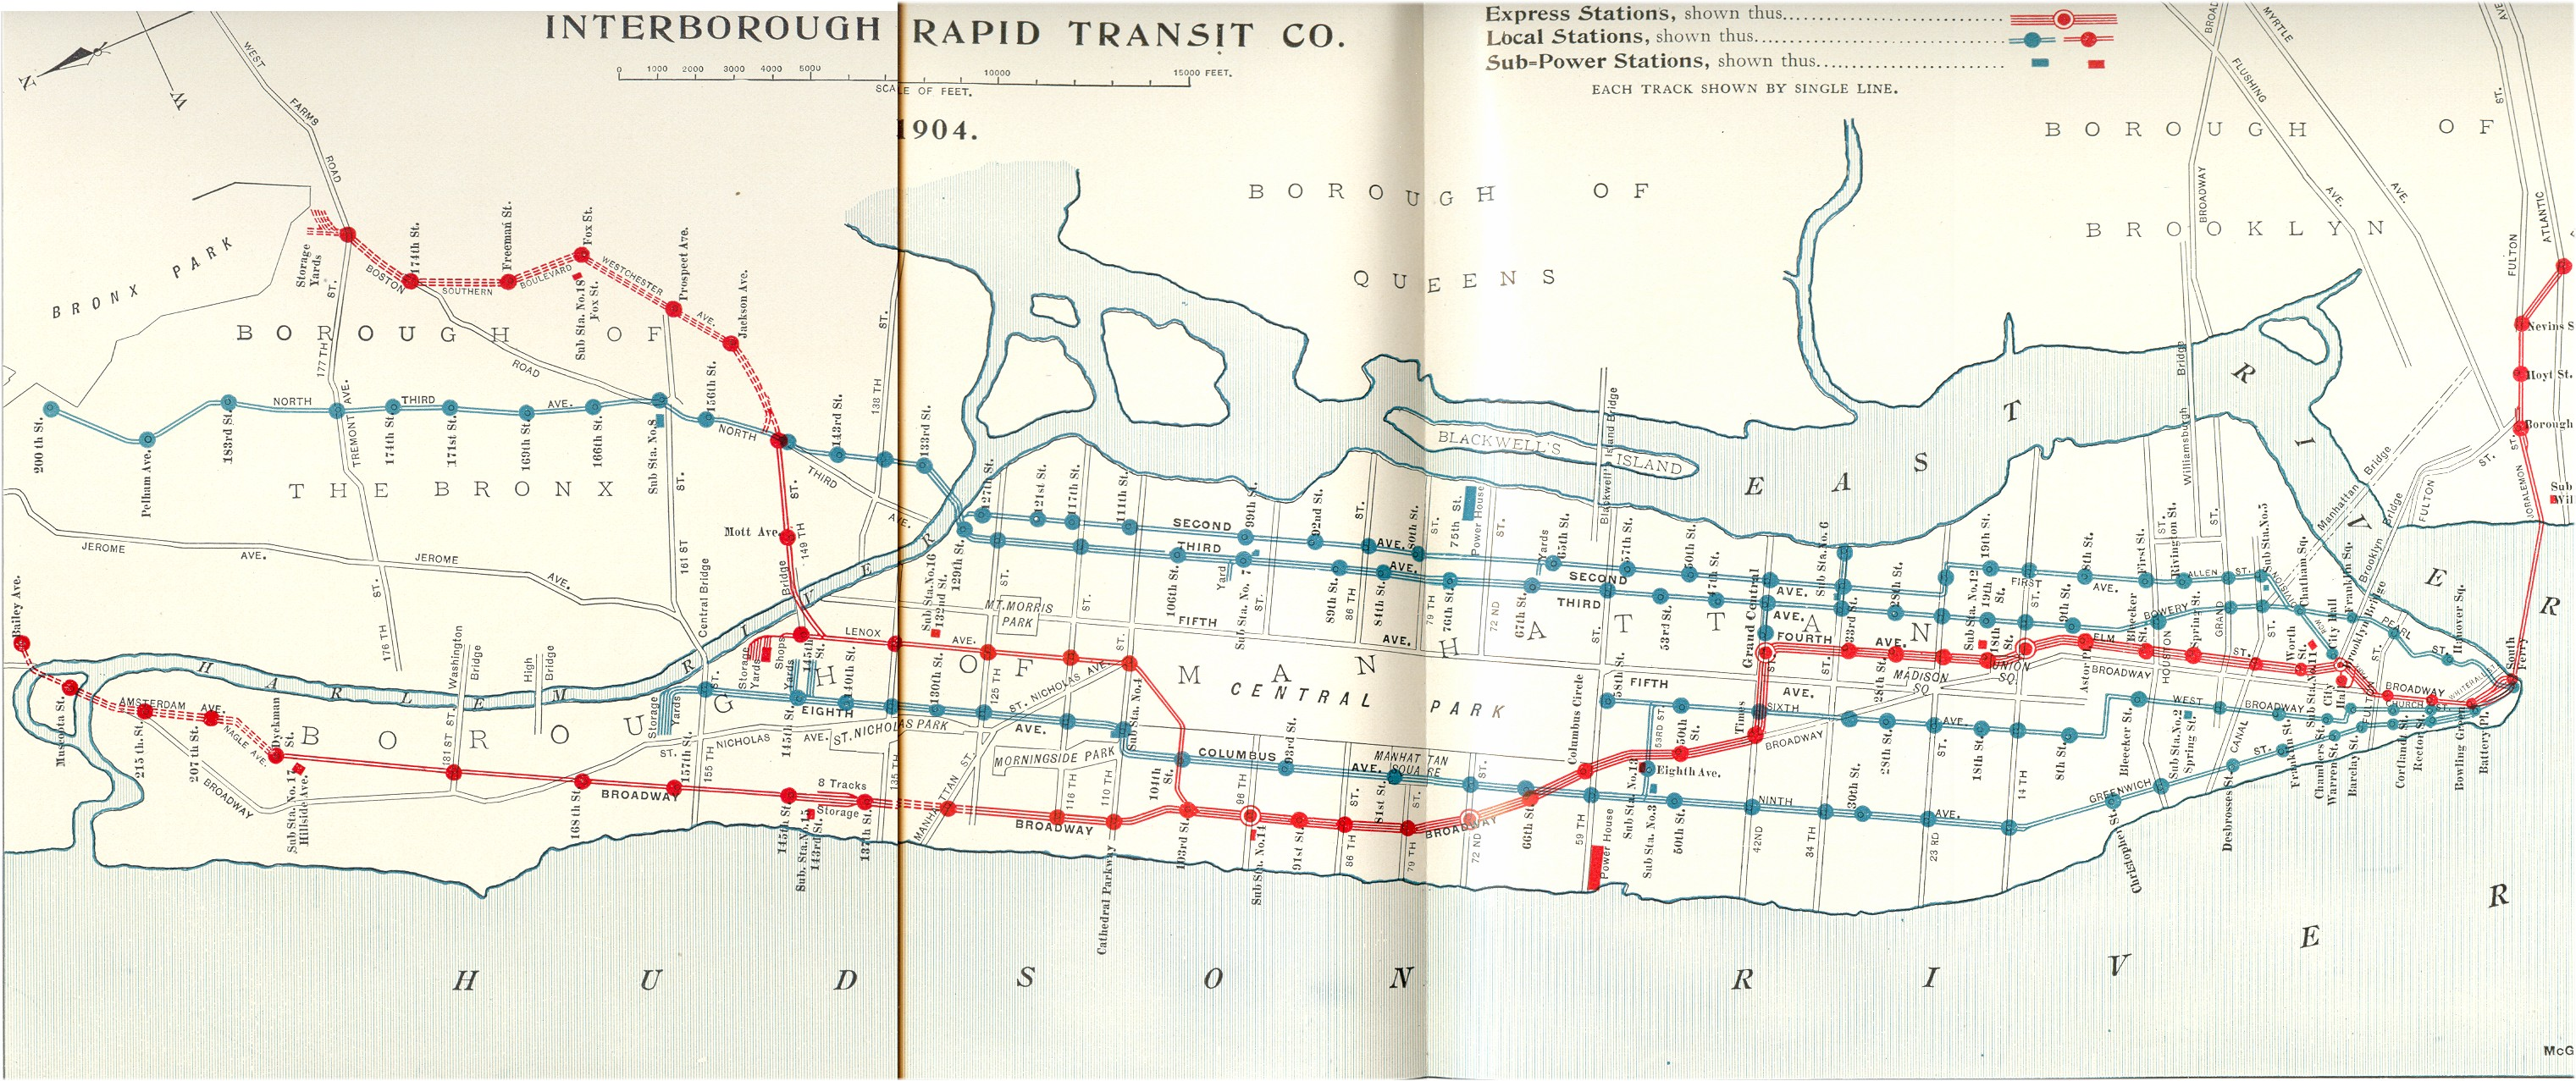 (1080k, 3042x1277)<br><b>Country:</b> United States<br><b>City:</b> New York<br><b>System:</b> New York City Transit<br><b>Location:</b> Interborough Subway<br><b>Photo by:</b> IRT Company<br><b>Date:</b> 1904<br><b>Notes:</b> IRT Subway: Interborough Rapid Transit Subway and Elevated Lines (<I>The New York Subway, Its Construction and Equipment</i>, 1904)<br><b>Viewed (this week/total):</b> 48 / 59654